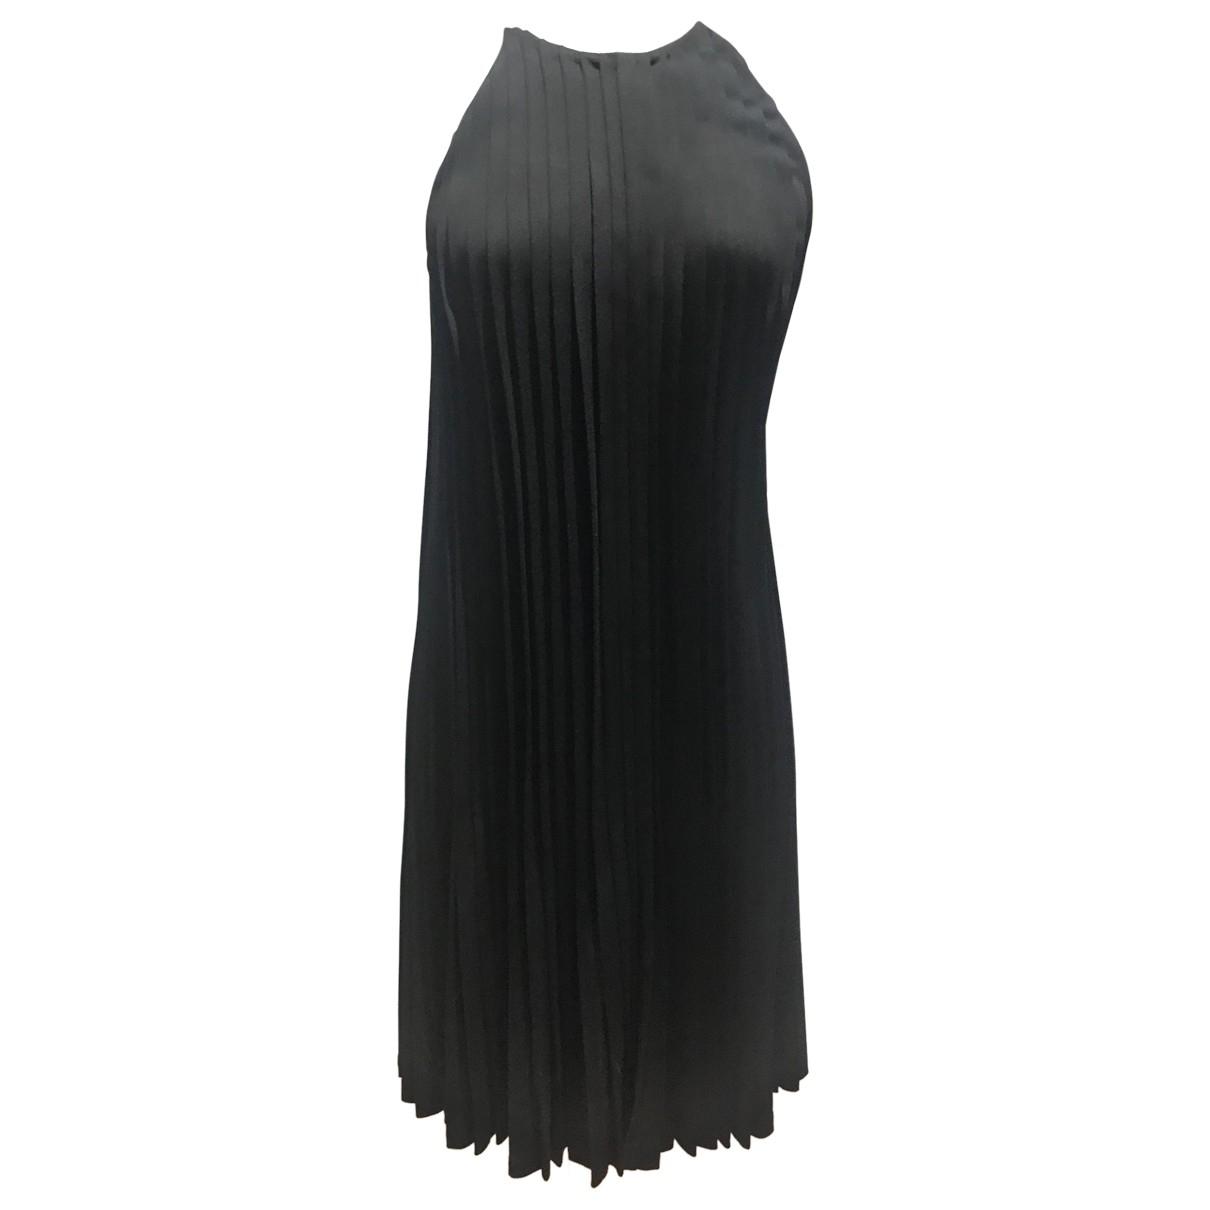 Polo Ralph Lauren \N Kleid in  Schwarz Synthetik